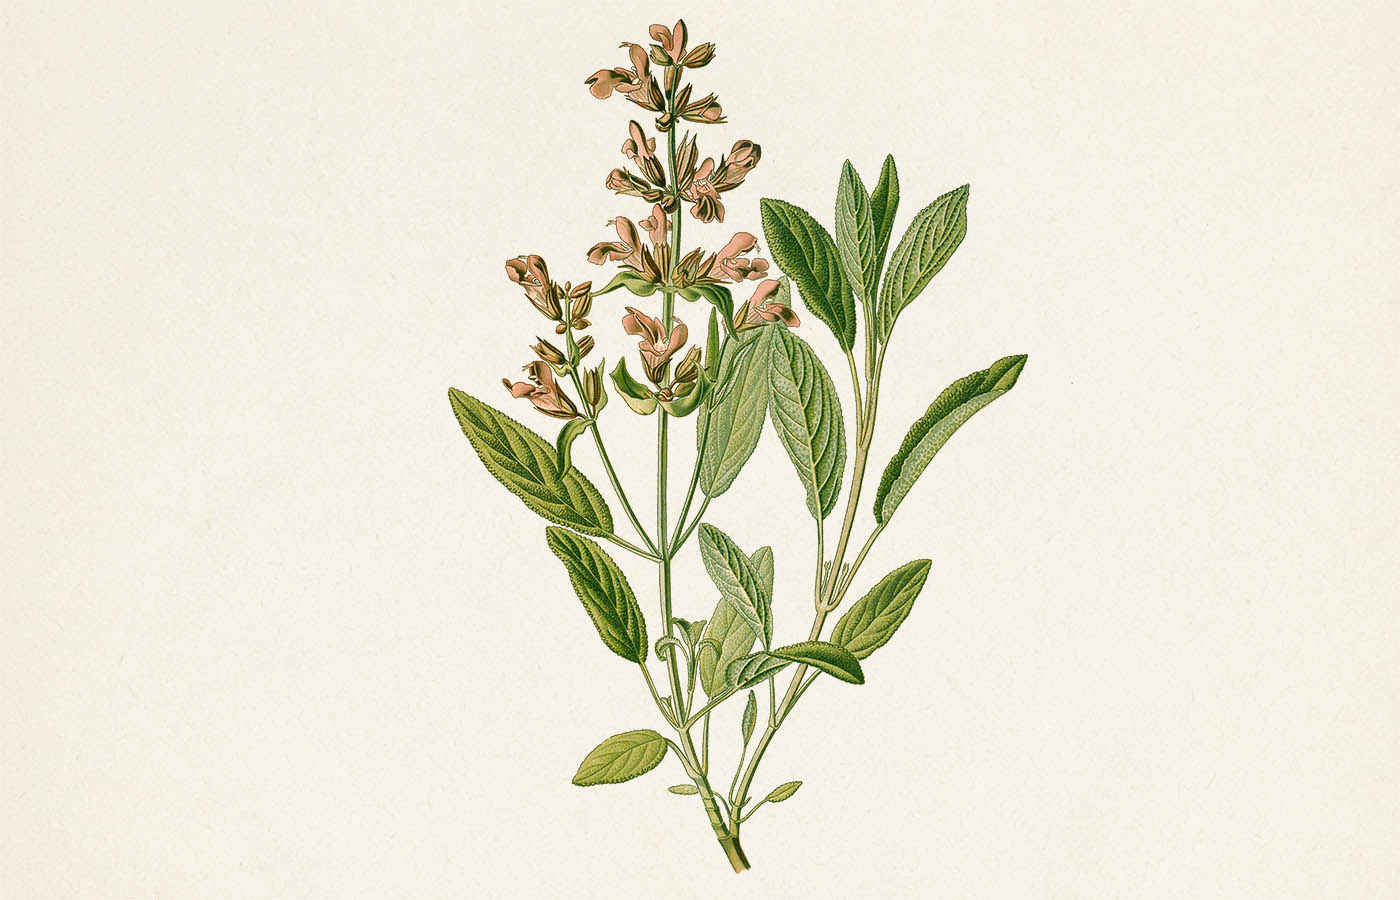 Šalvěj lékařská (Salvia oficinalis)